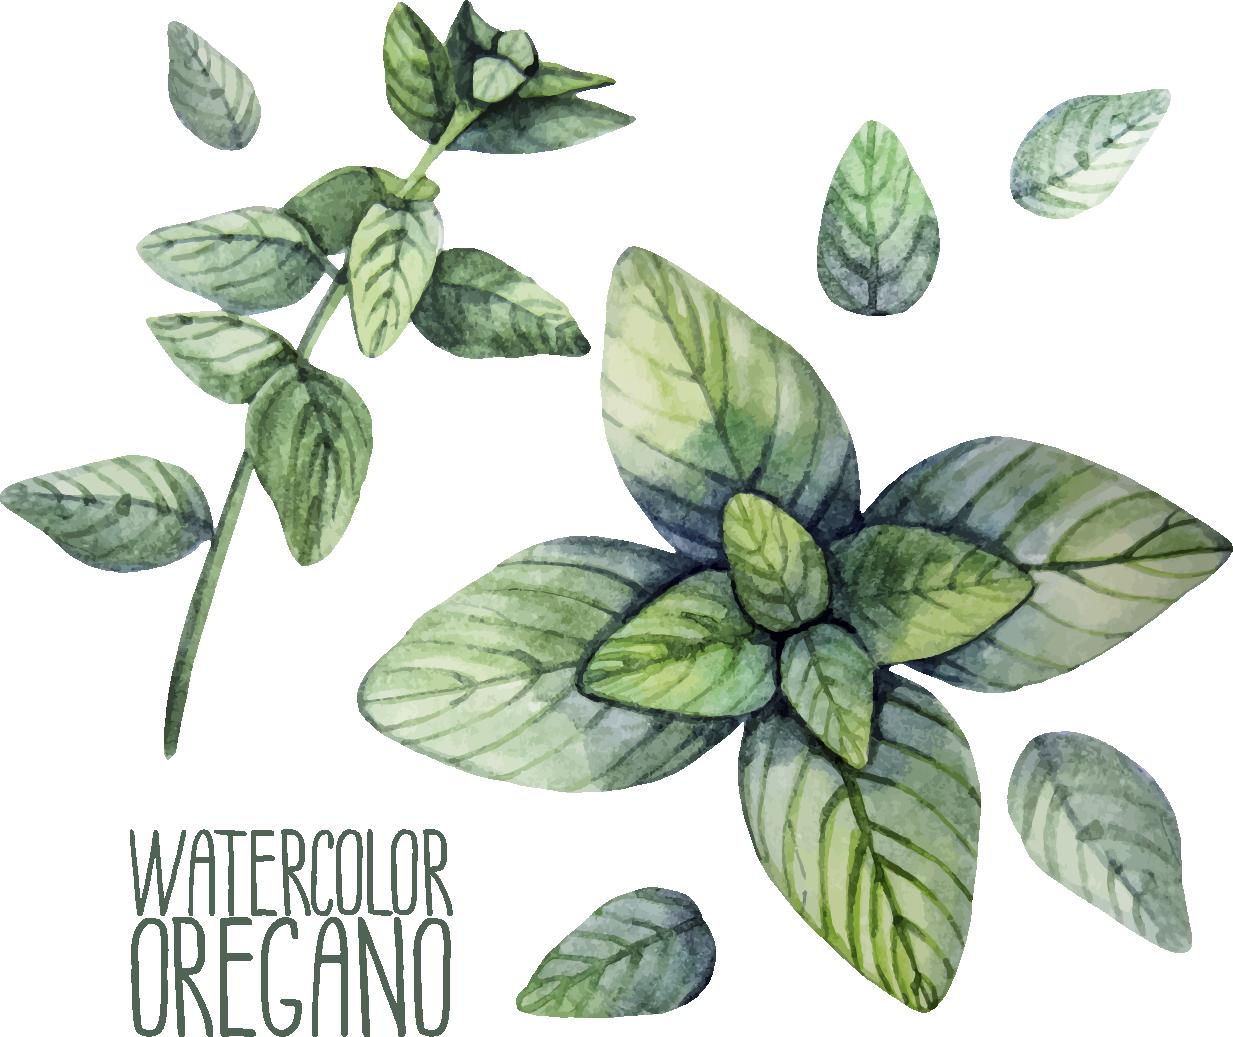 svg freeuse download Herb oregano watercolor painting. Basil drawing botanical illustration